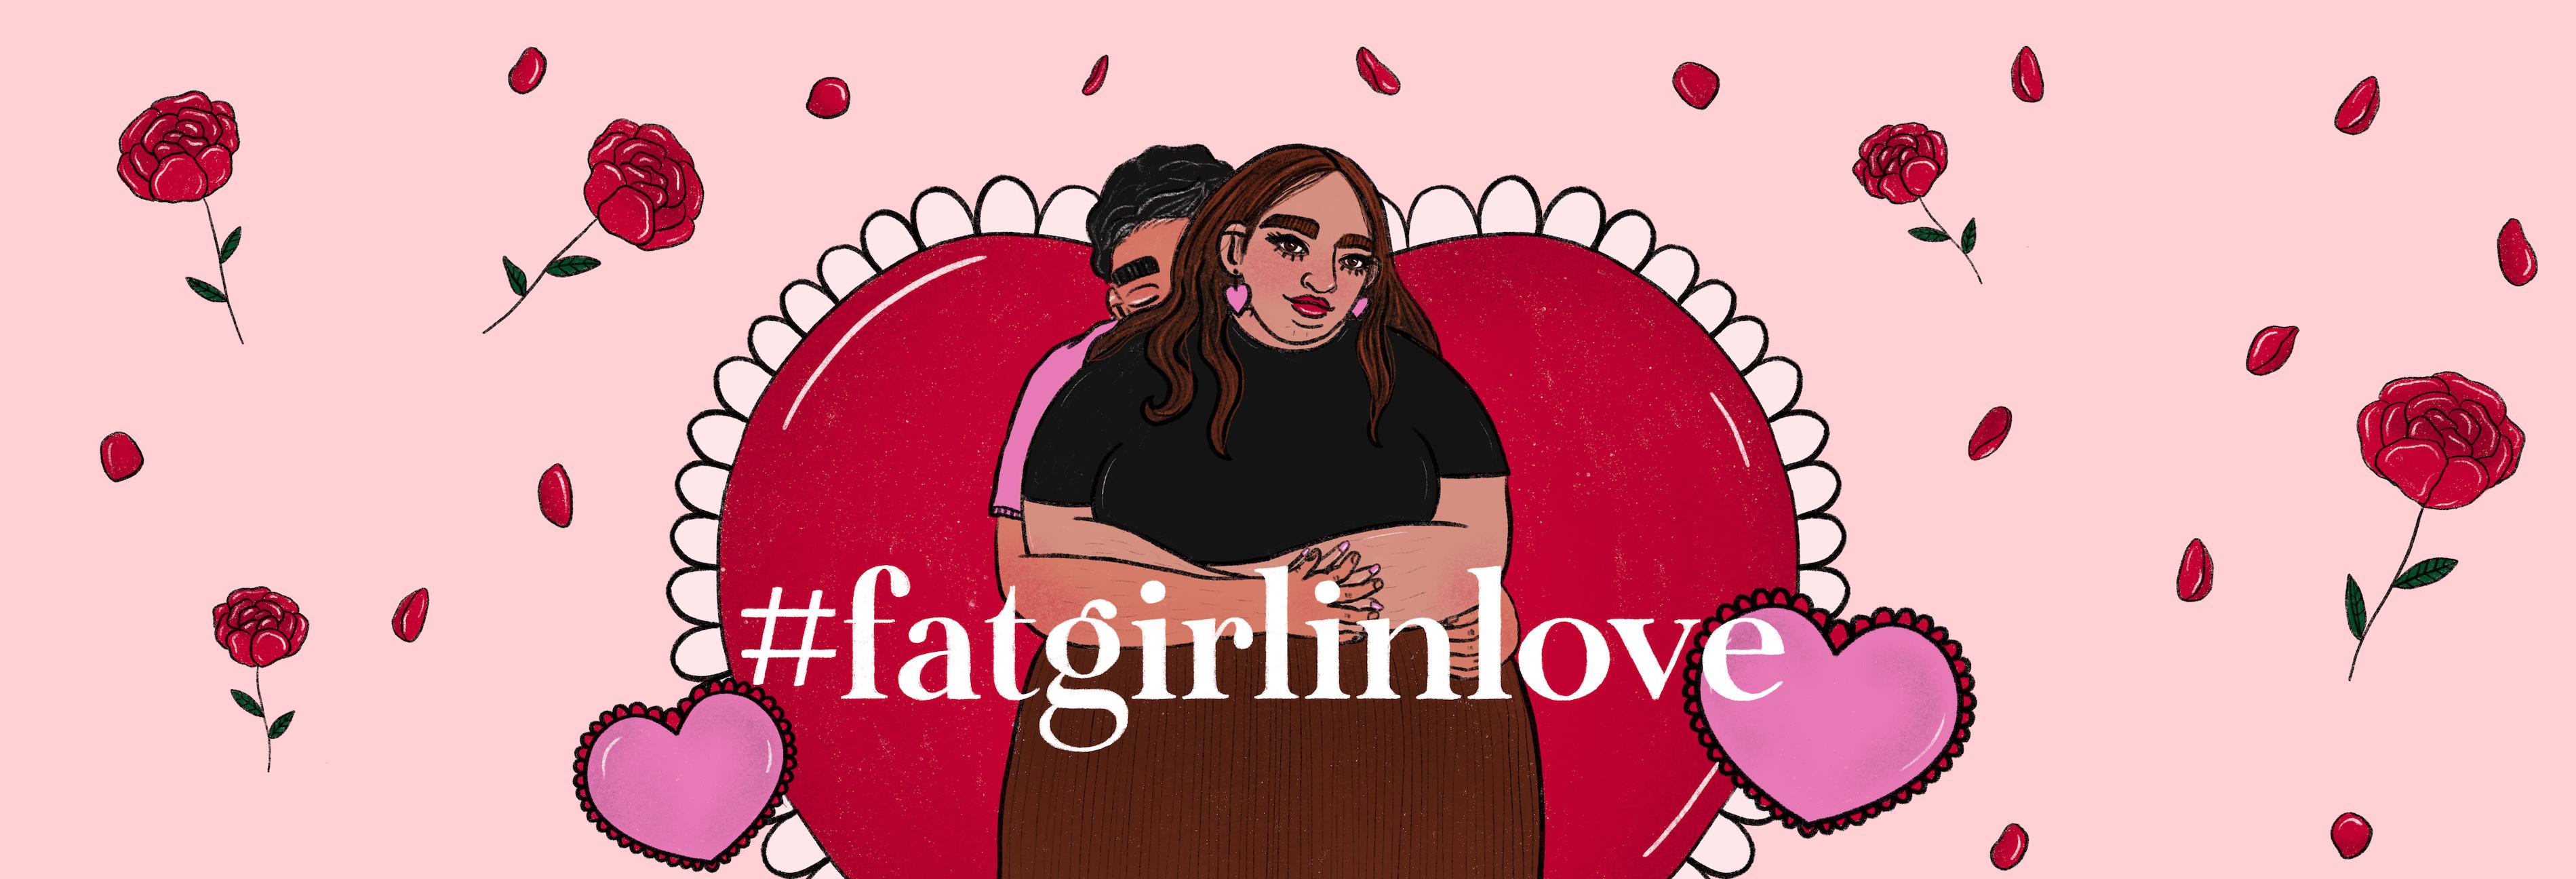 Fat girl in love Series by Ori